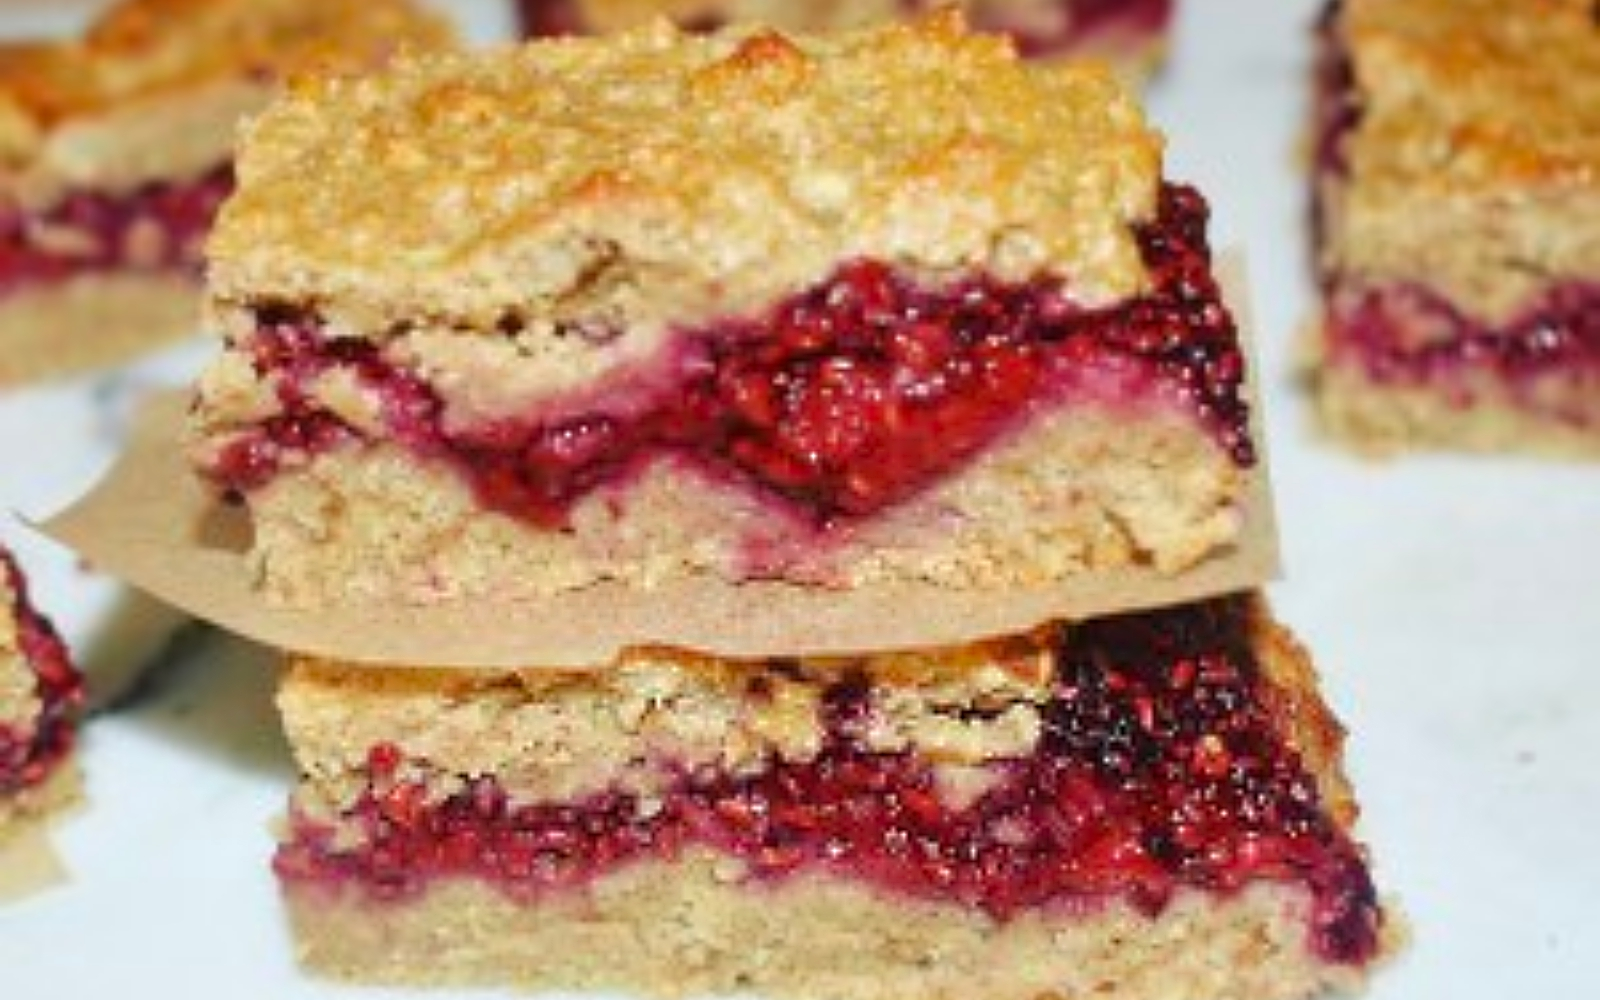 Vegan Gluten-free Raspberry and Chia Jam Oat Bars